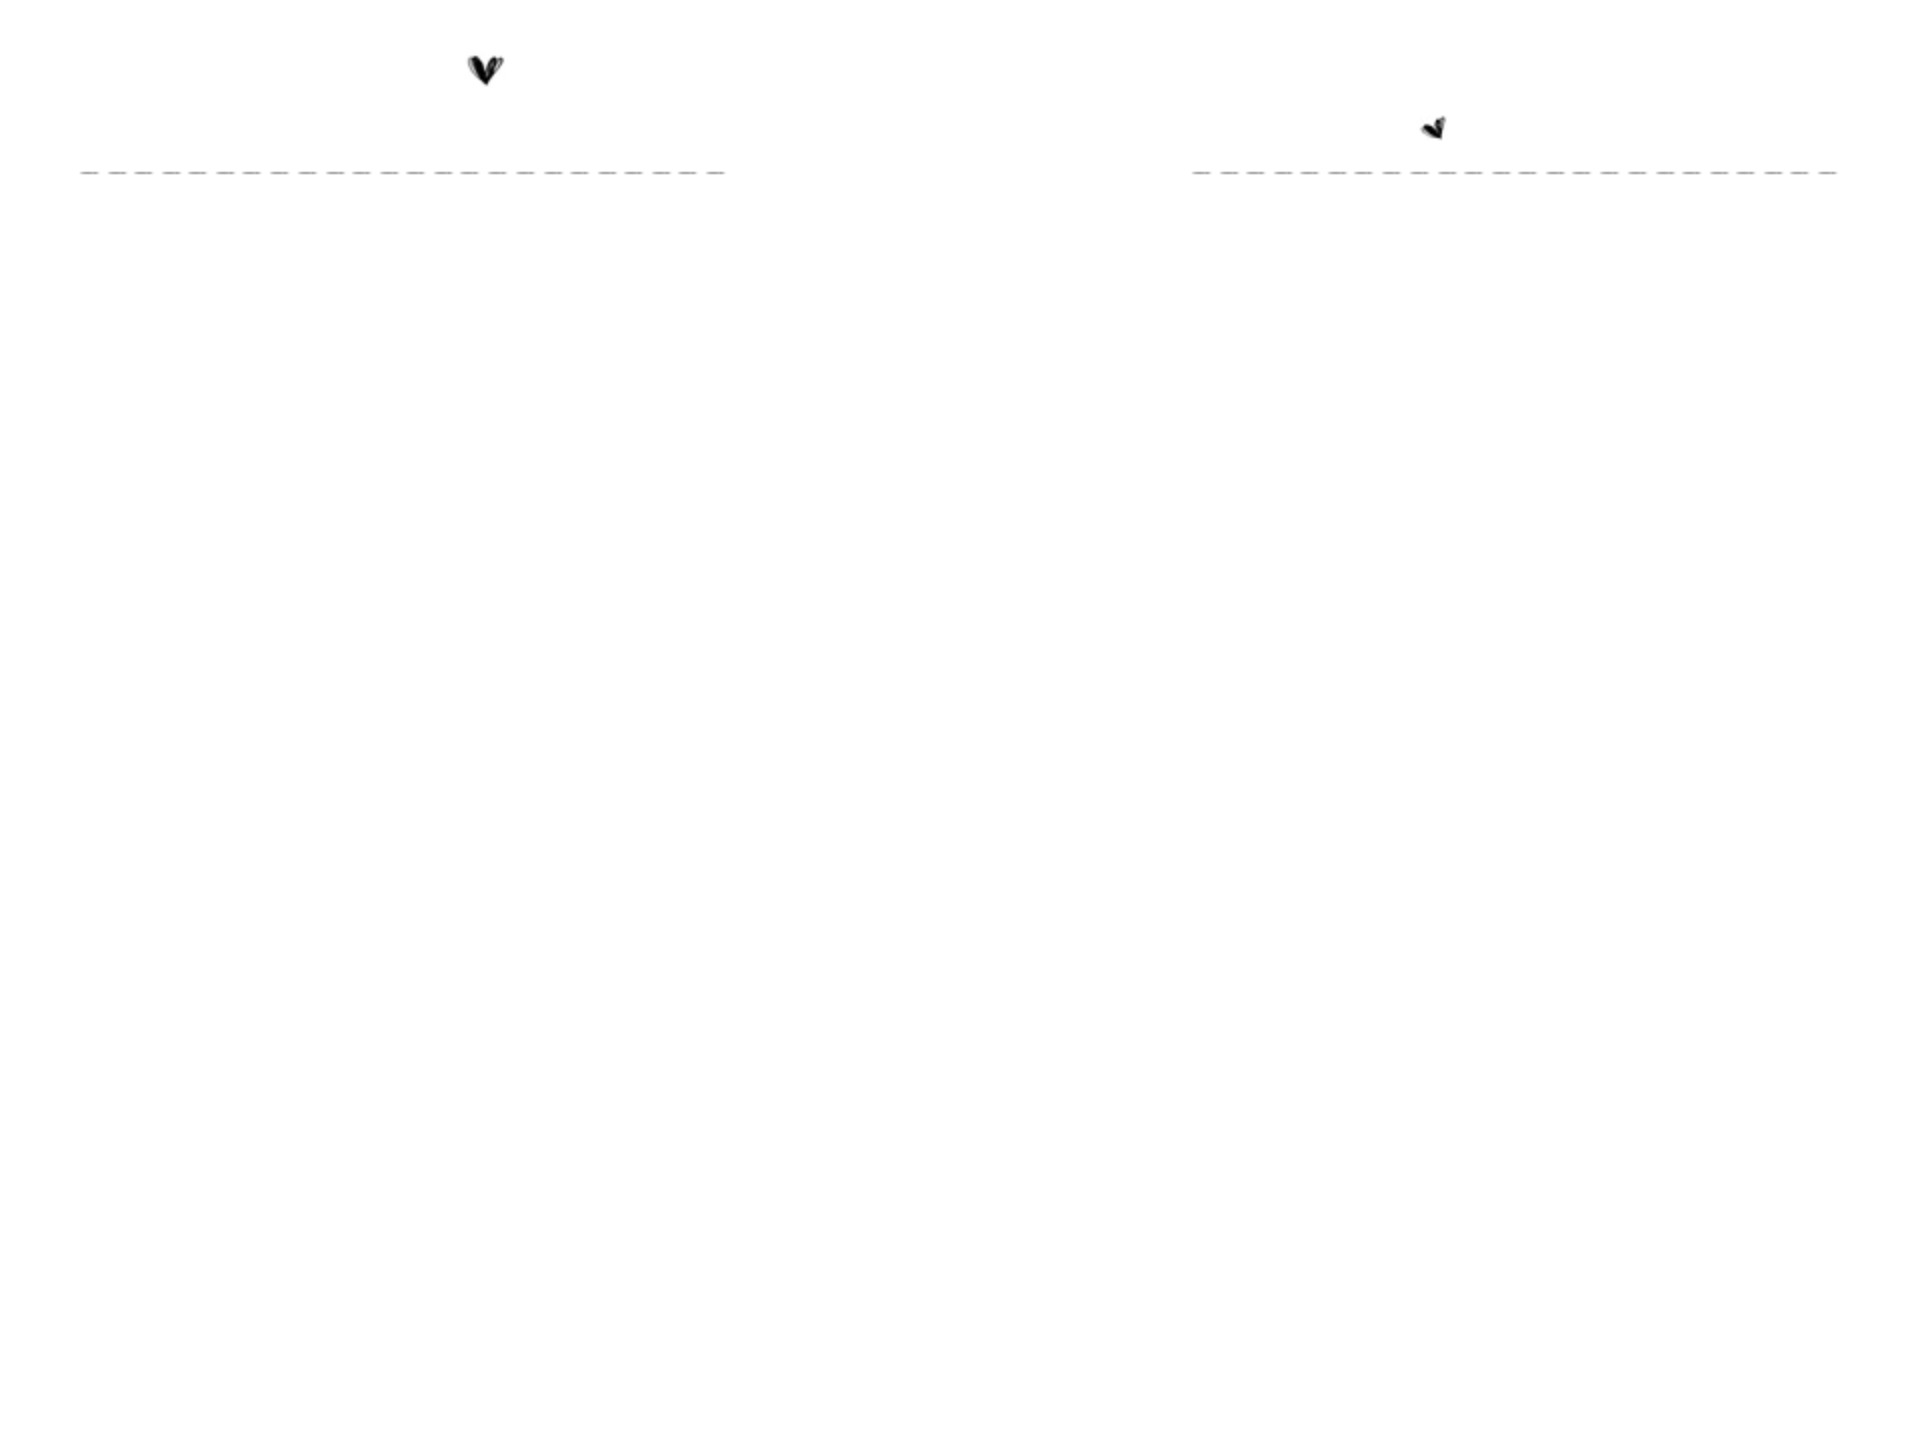 HTB1KCI9XInrK1RkHFrdq6xCoFXak.jpg?width=1916&height=1434&hash=3350